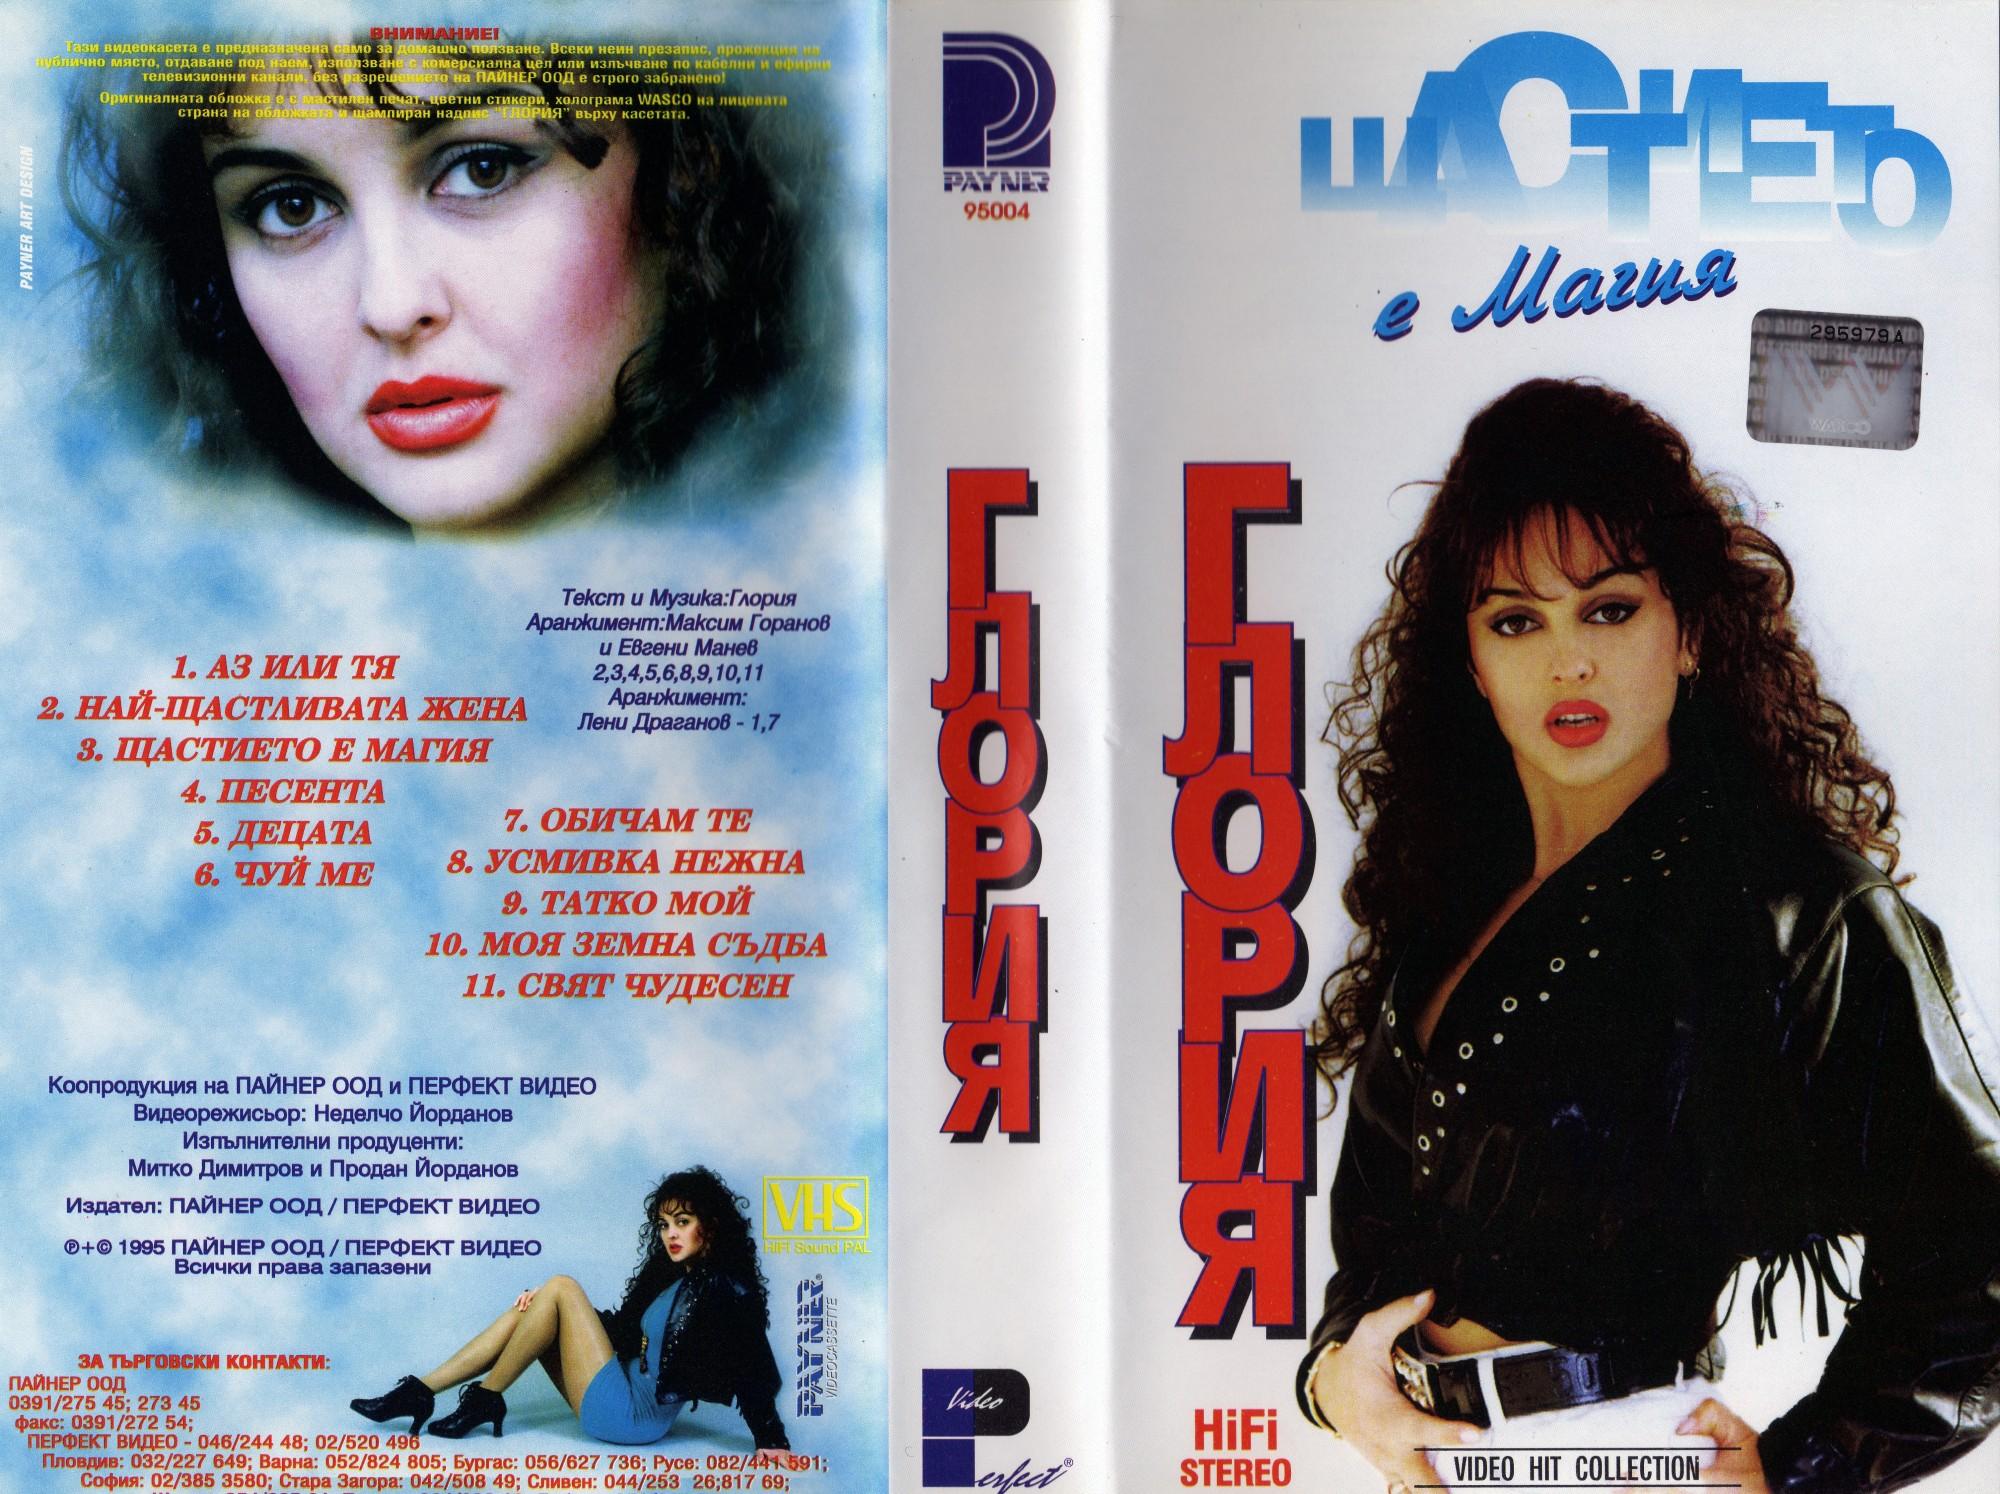 Магия 1995